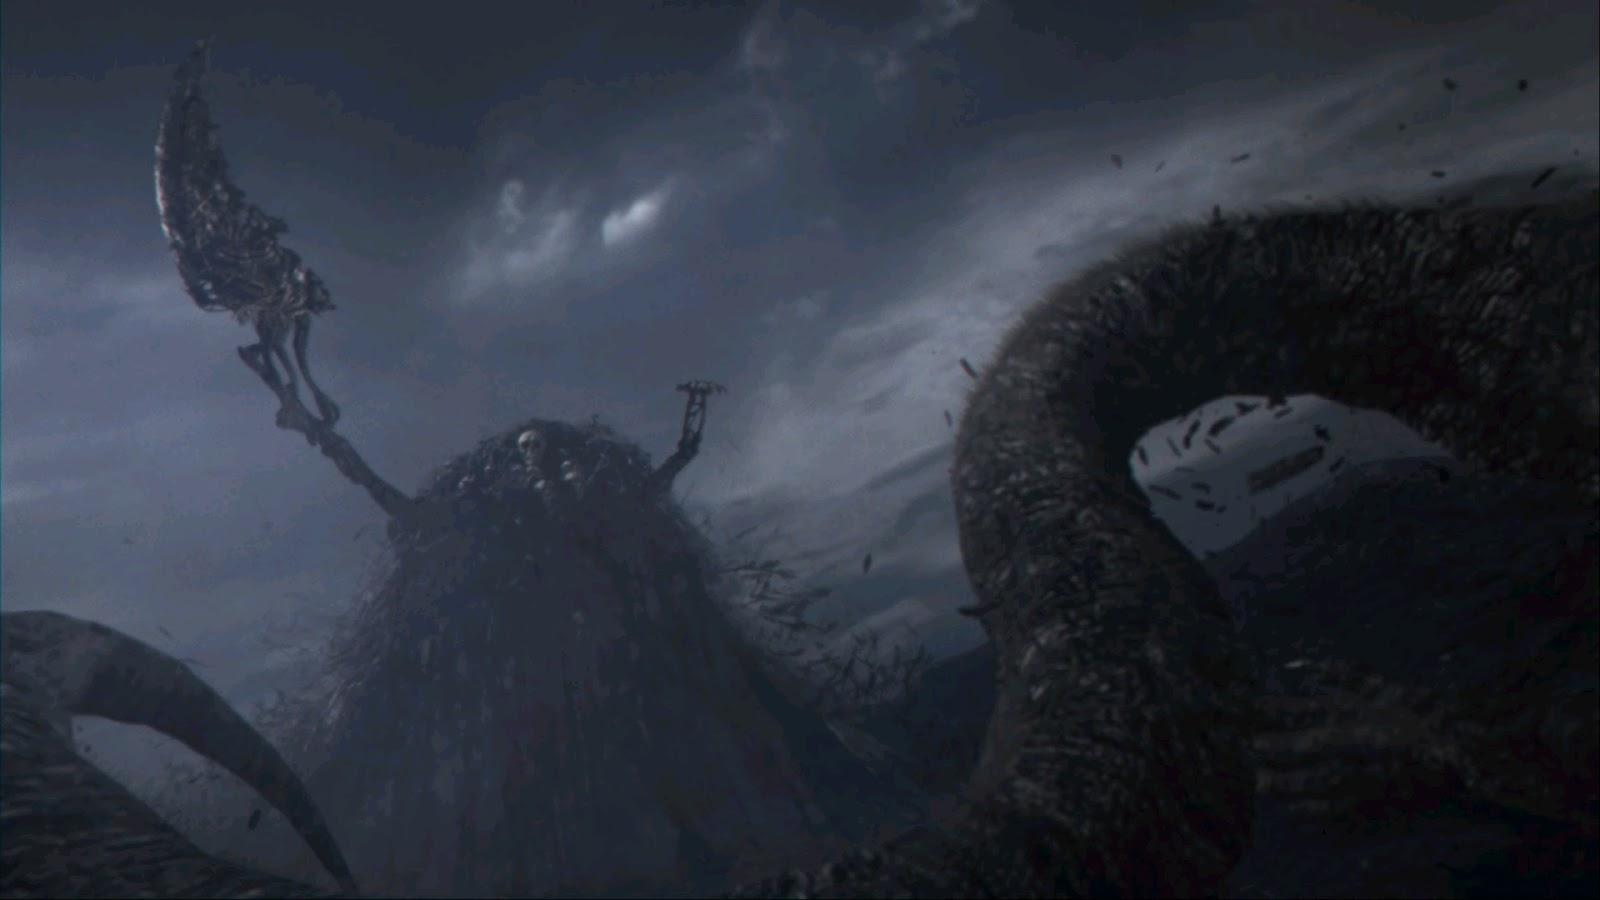 Dark Souls Intro Nito Unleashed A Miasma Of Death